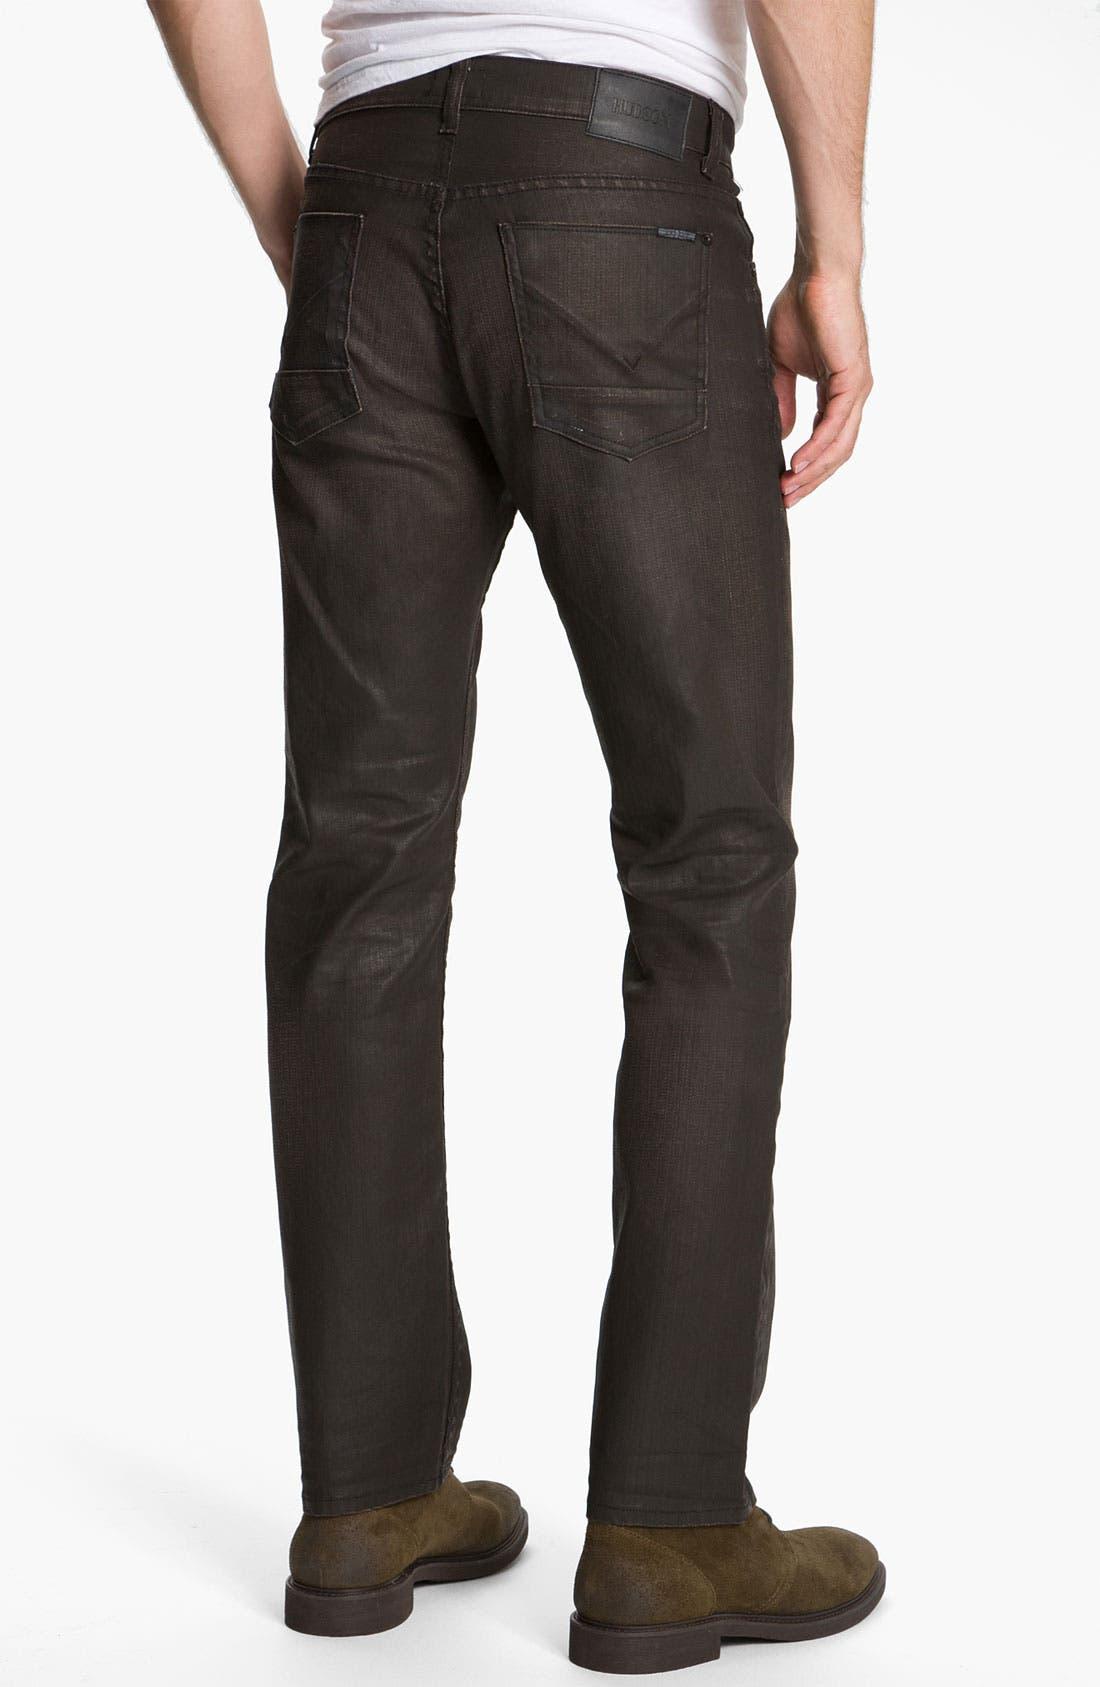 Alternate Image 1 Selected - Hudson Jeans 'Byron' Coated Straight Leg Jeans (Tomahawk)